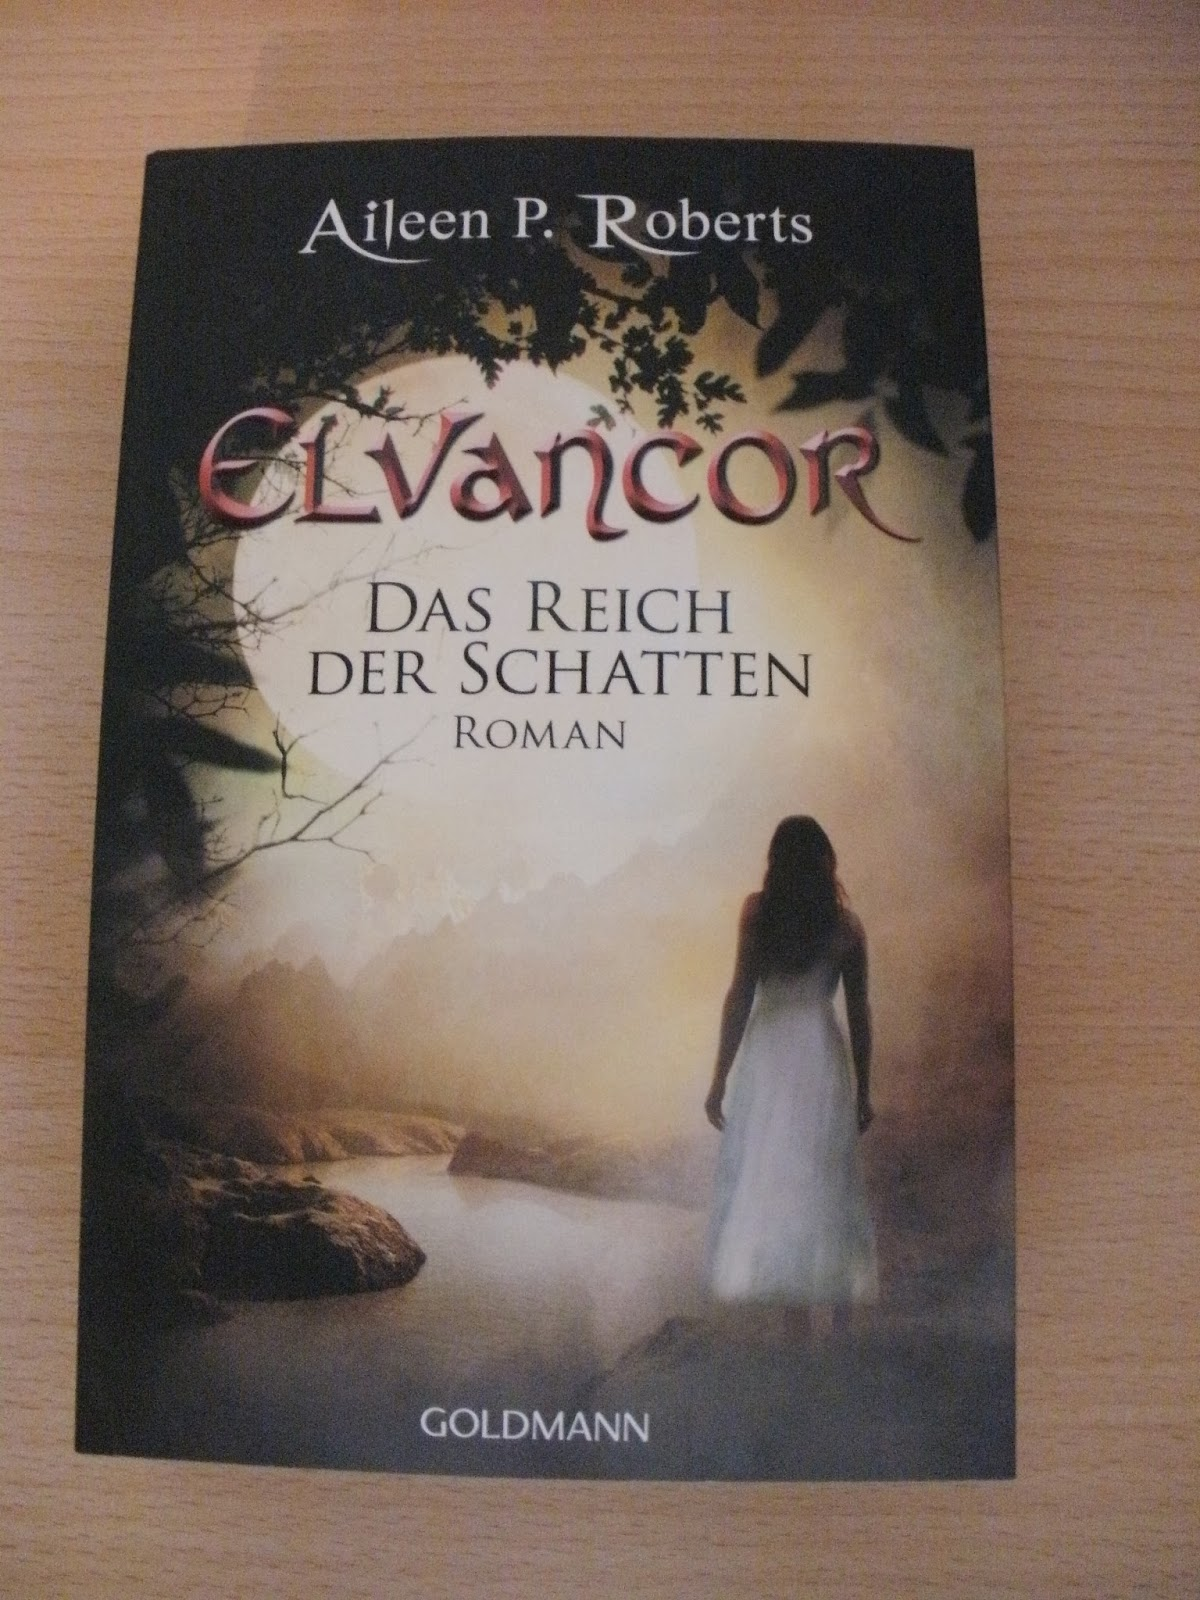 http://www.amazon.de/Das-Reich-Schatten-Elvancor-Roman-ebook/dp/B00E7PVO18/ref=sr_1_2?s=books&ie=UTF8&qid=1424039667&sr=1-2&keywords=elvancor